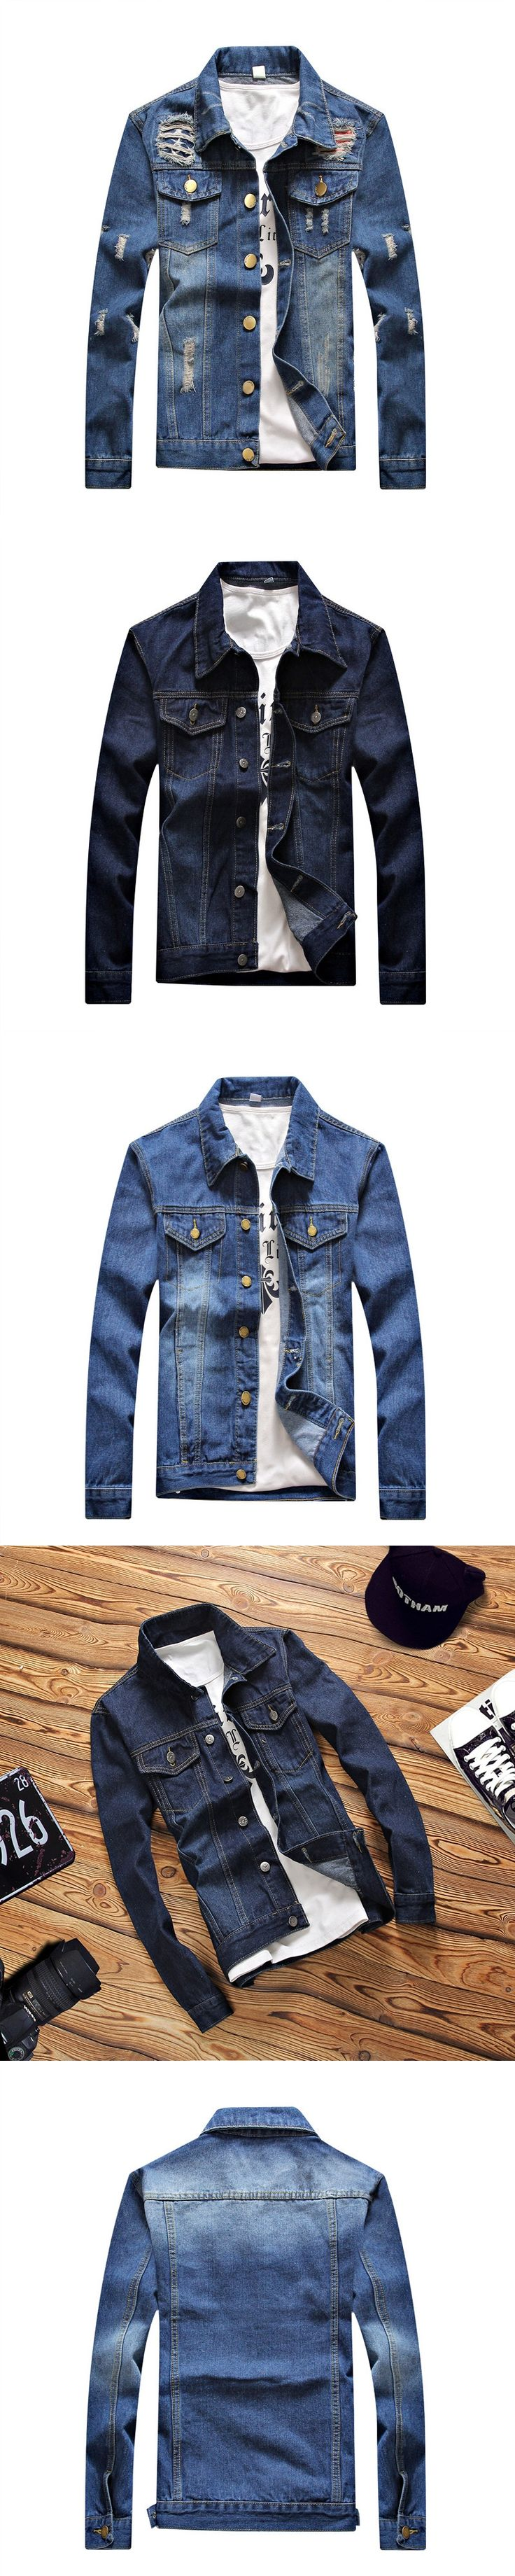 2017 mens denim jacket brand clothing Jeans Jackets for men Bomber Jacket Homme Chaquetas Hombre man Outerwear & Coats BLUE 4XL